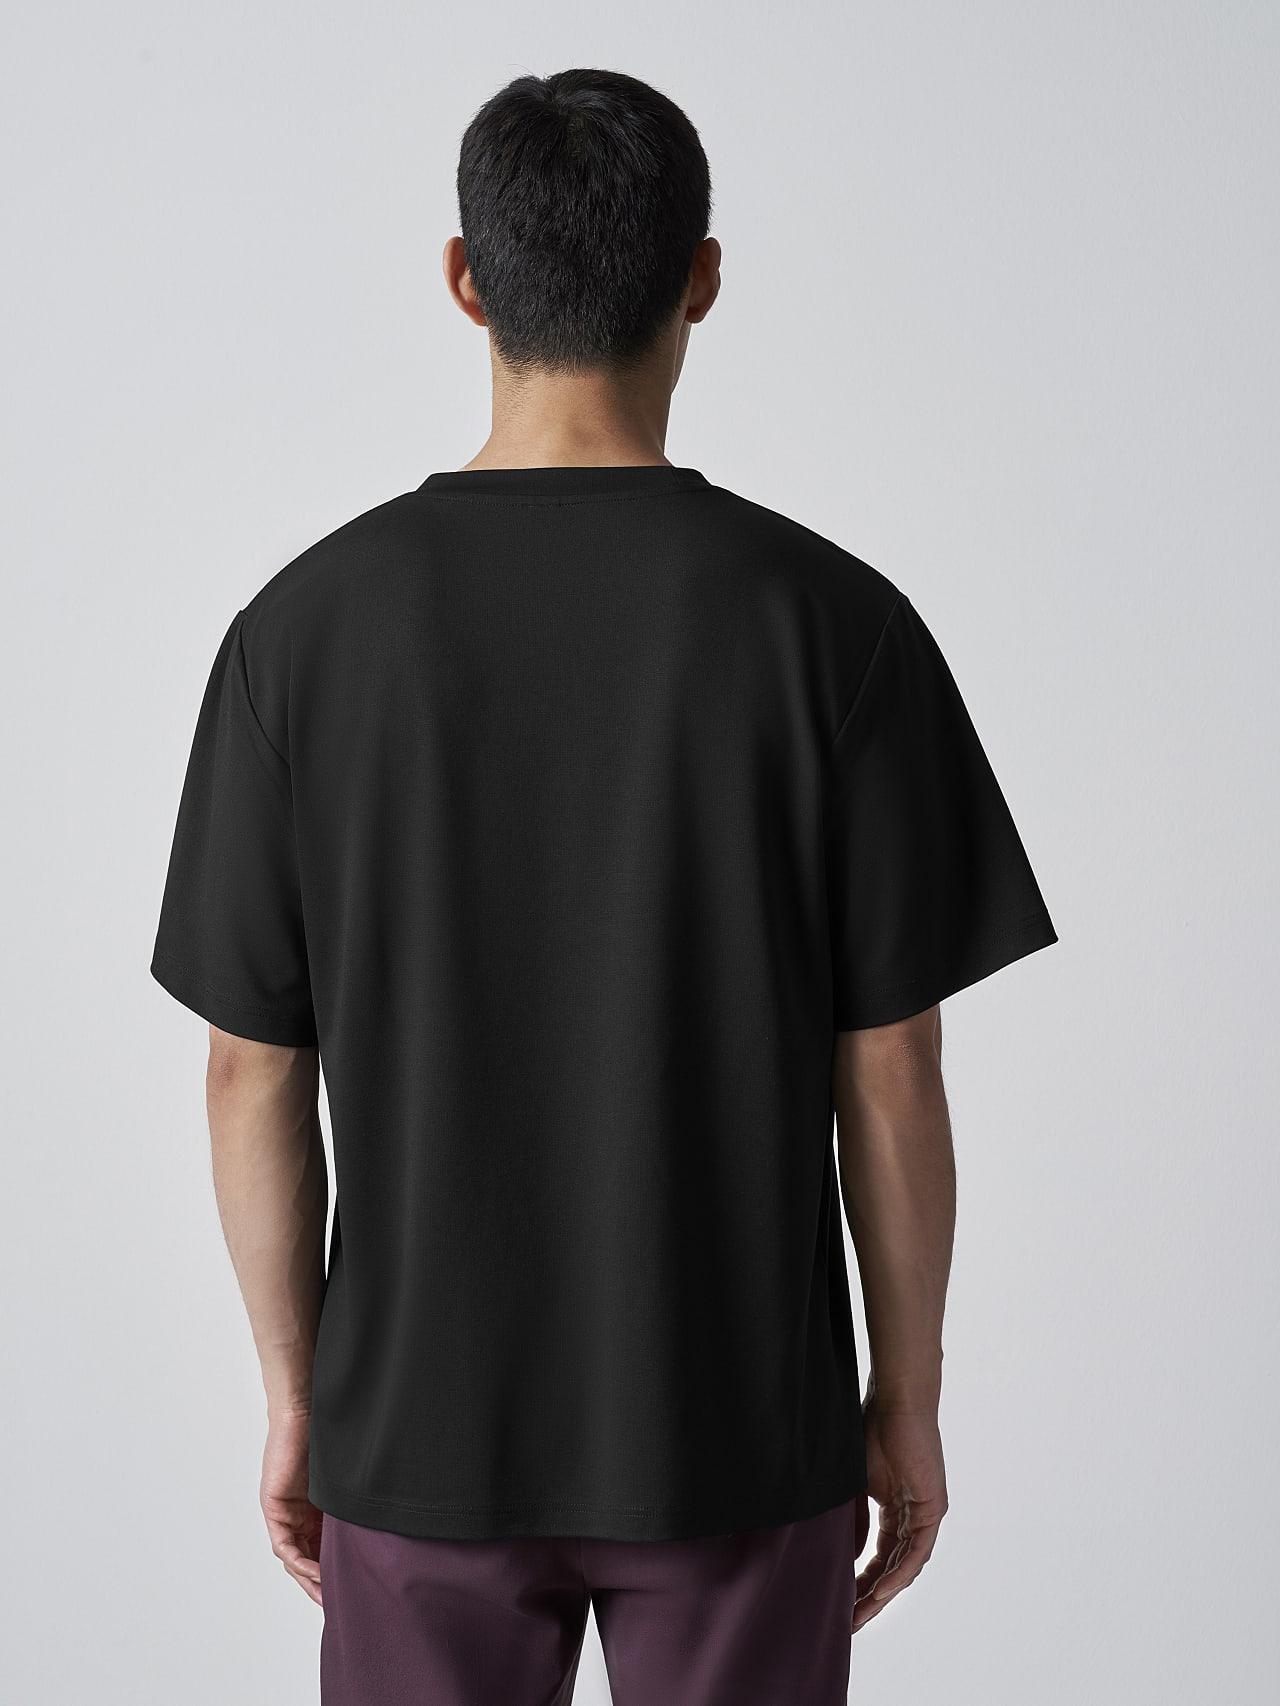 JAHEV V1.Y5.02 Relaxed Logo T-Shirt black Front Main Alpha Tauri